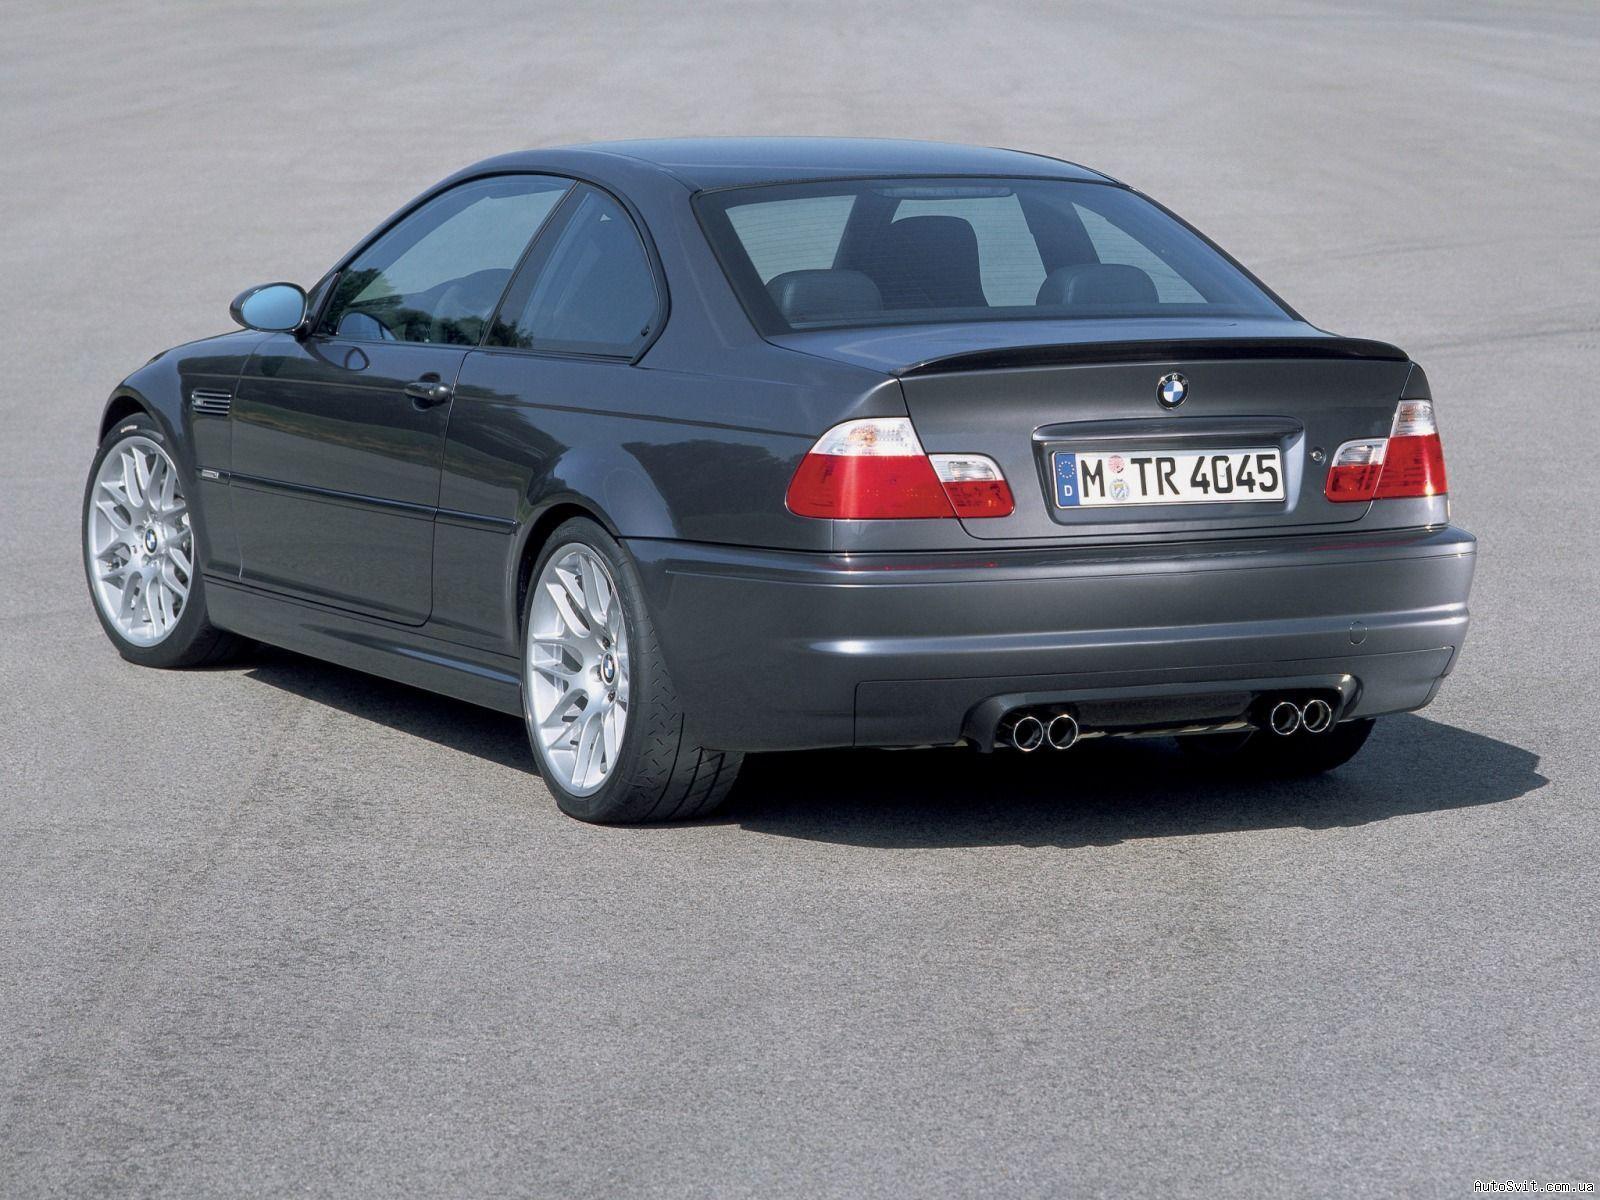 bmw m3 csl   BMW M3 CSL 2003 фотографии. BMW M3 CSL 2003 Обои на ...